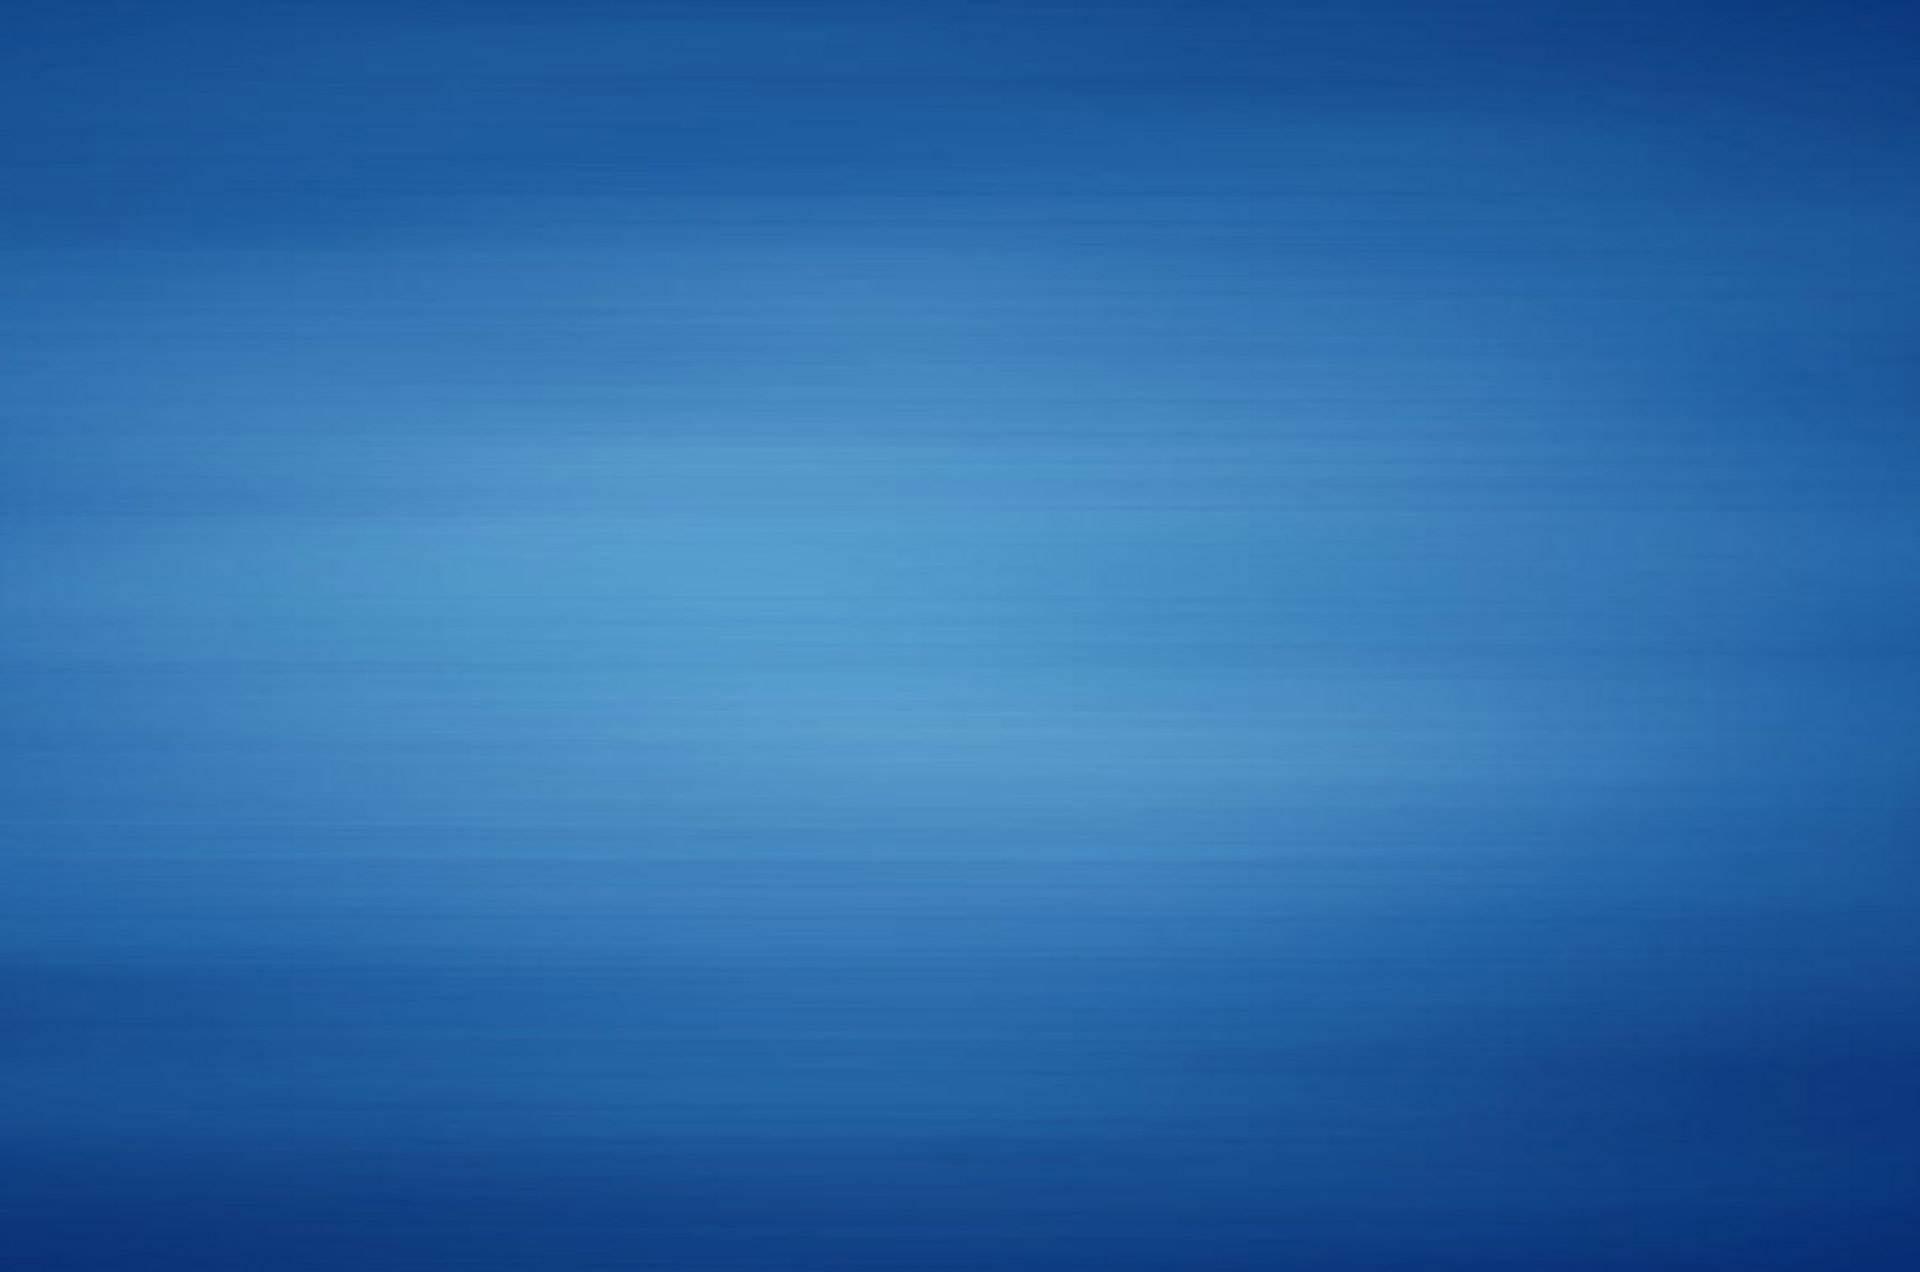 blue-abstract-background (1) | Node LLC